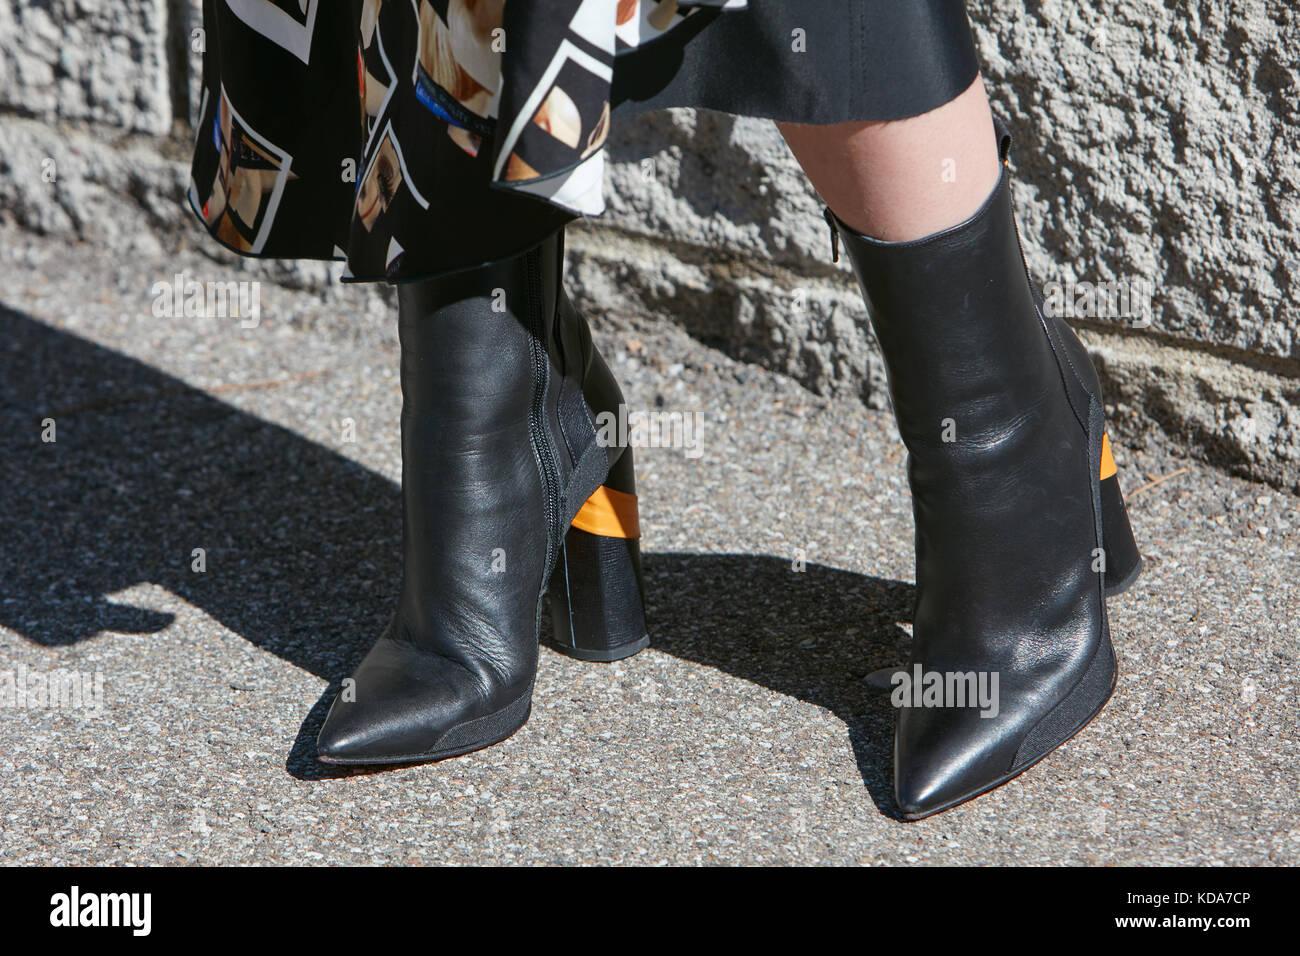 aa724e69 Milán - 20 de septiembre: mujer con botas de tacón alto de cuero ...